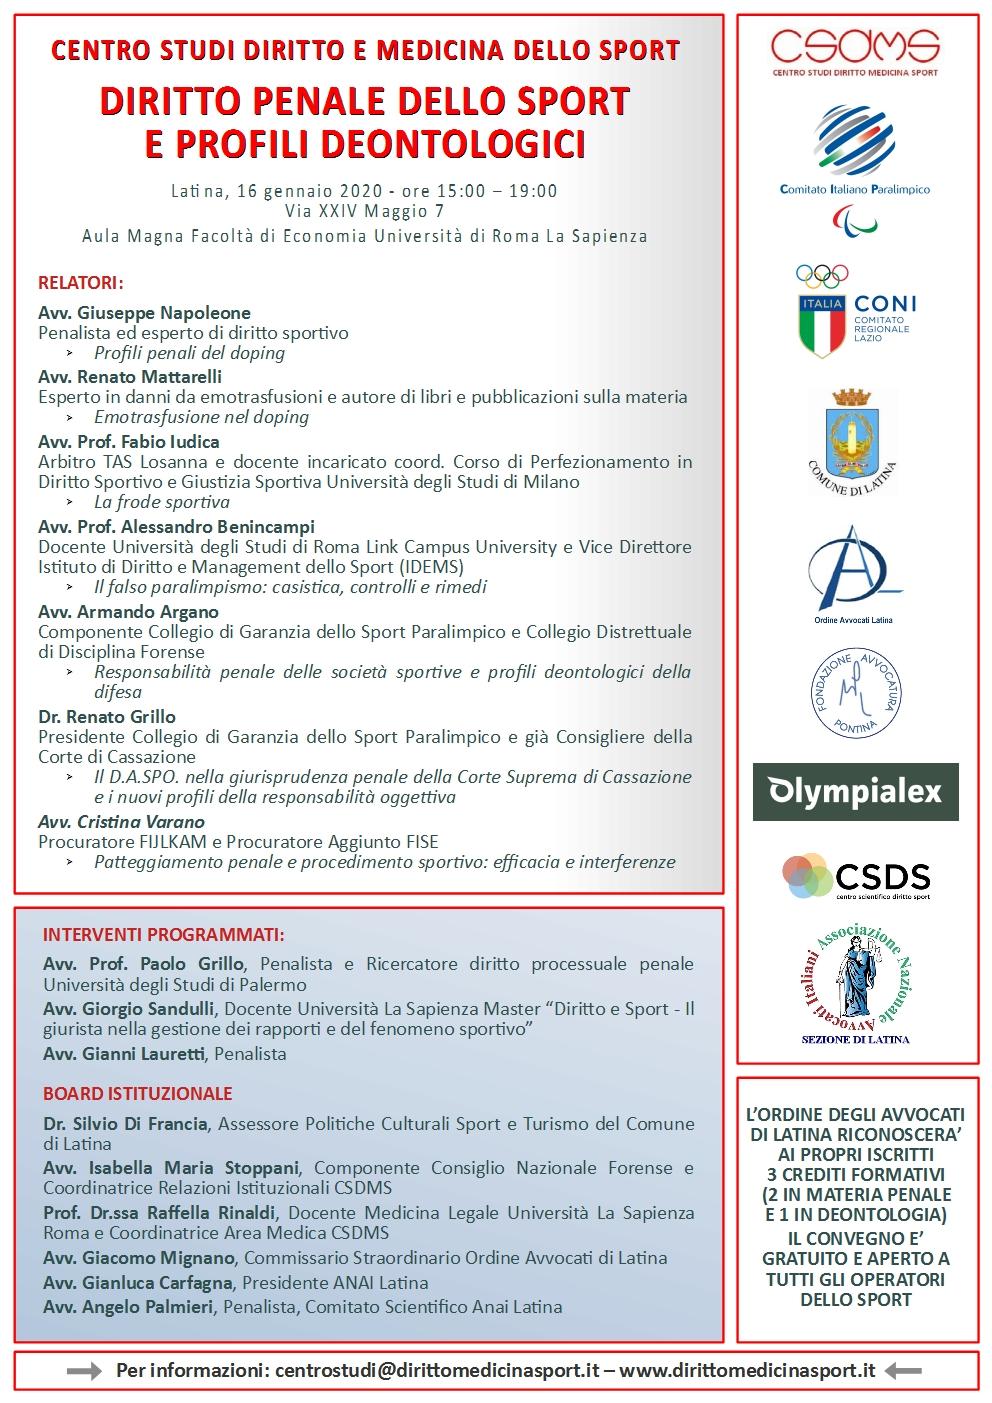 CSDMS-16GEN2020-DIRITTO-PENALE-SPORT